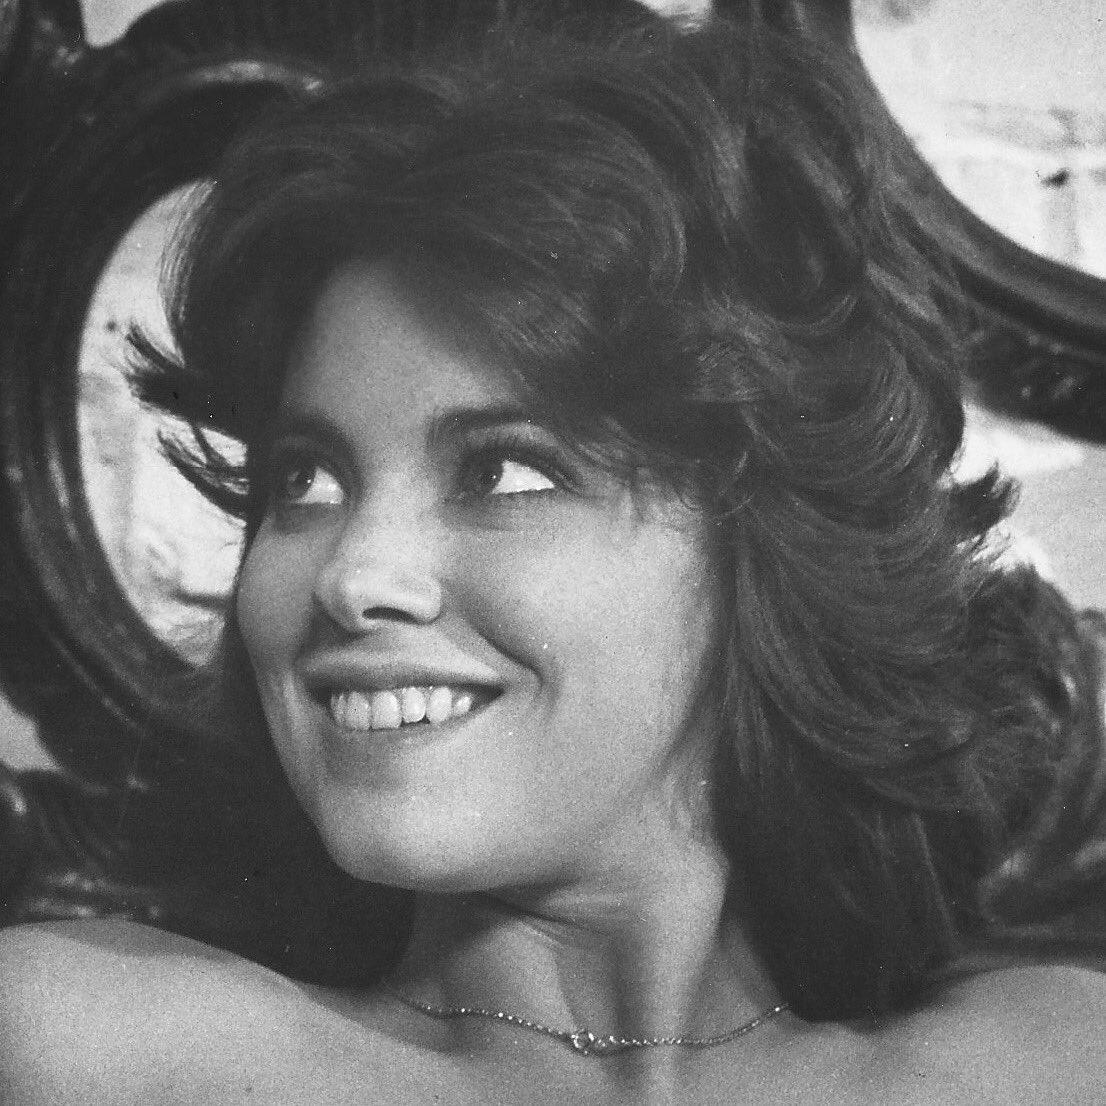 #LynneFrederick in #PeteWalker's #Schizo #horrorfilm #slasherfilm #screamqueen #EnglishRose #LynneFrederickFanPage • #celebrities #oldhollywood #vintage #movies #films #cinema #photography #beautiful #1970s #british #britishfilm #beauty #beautifulwoman #actress #popculturepic.twitter.com/YD0pQWCMzz